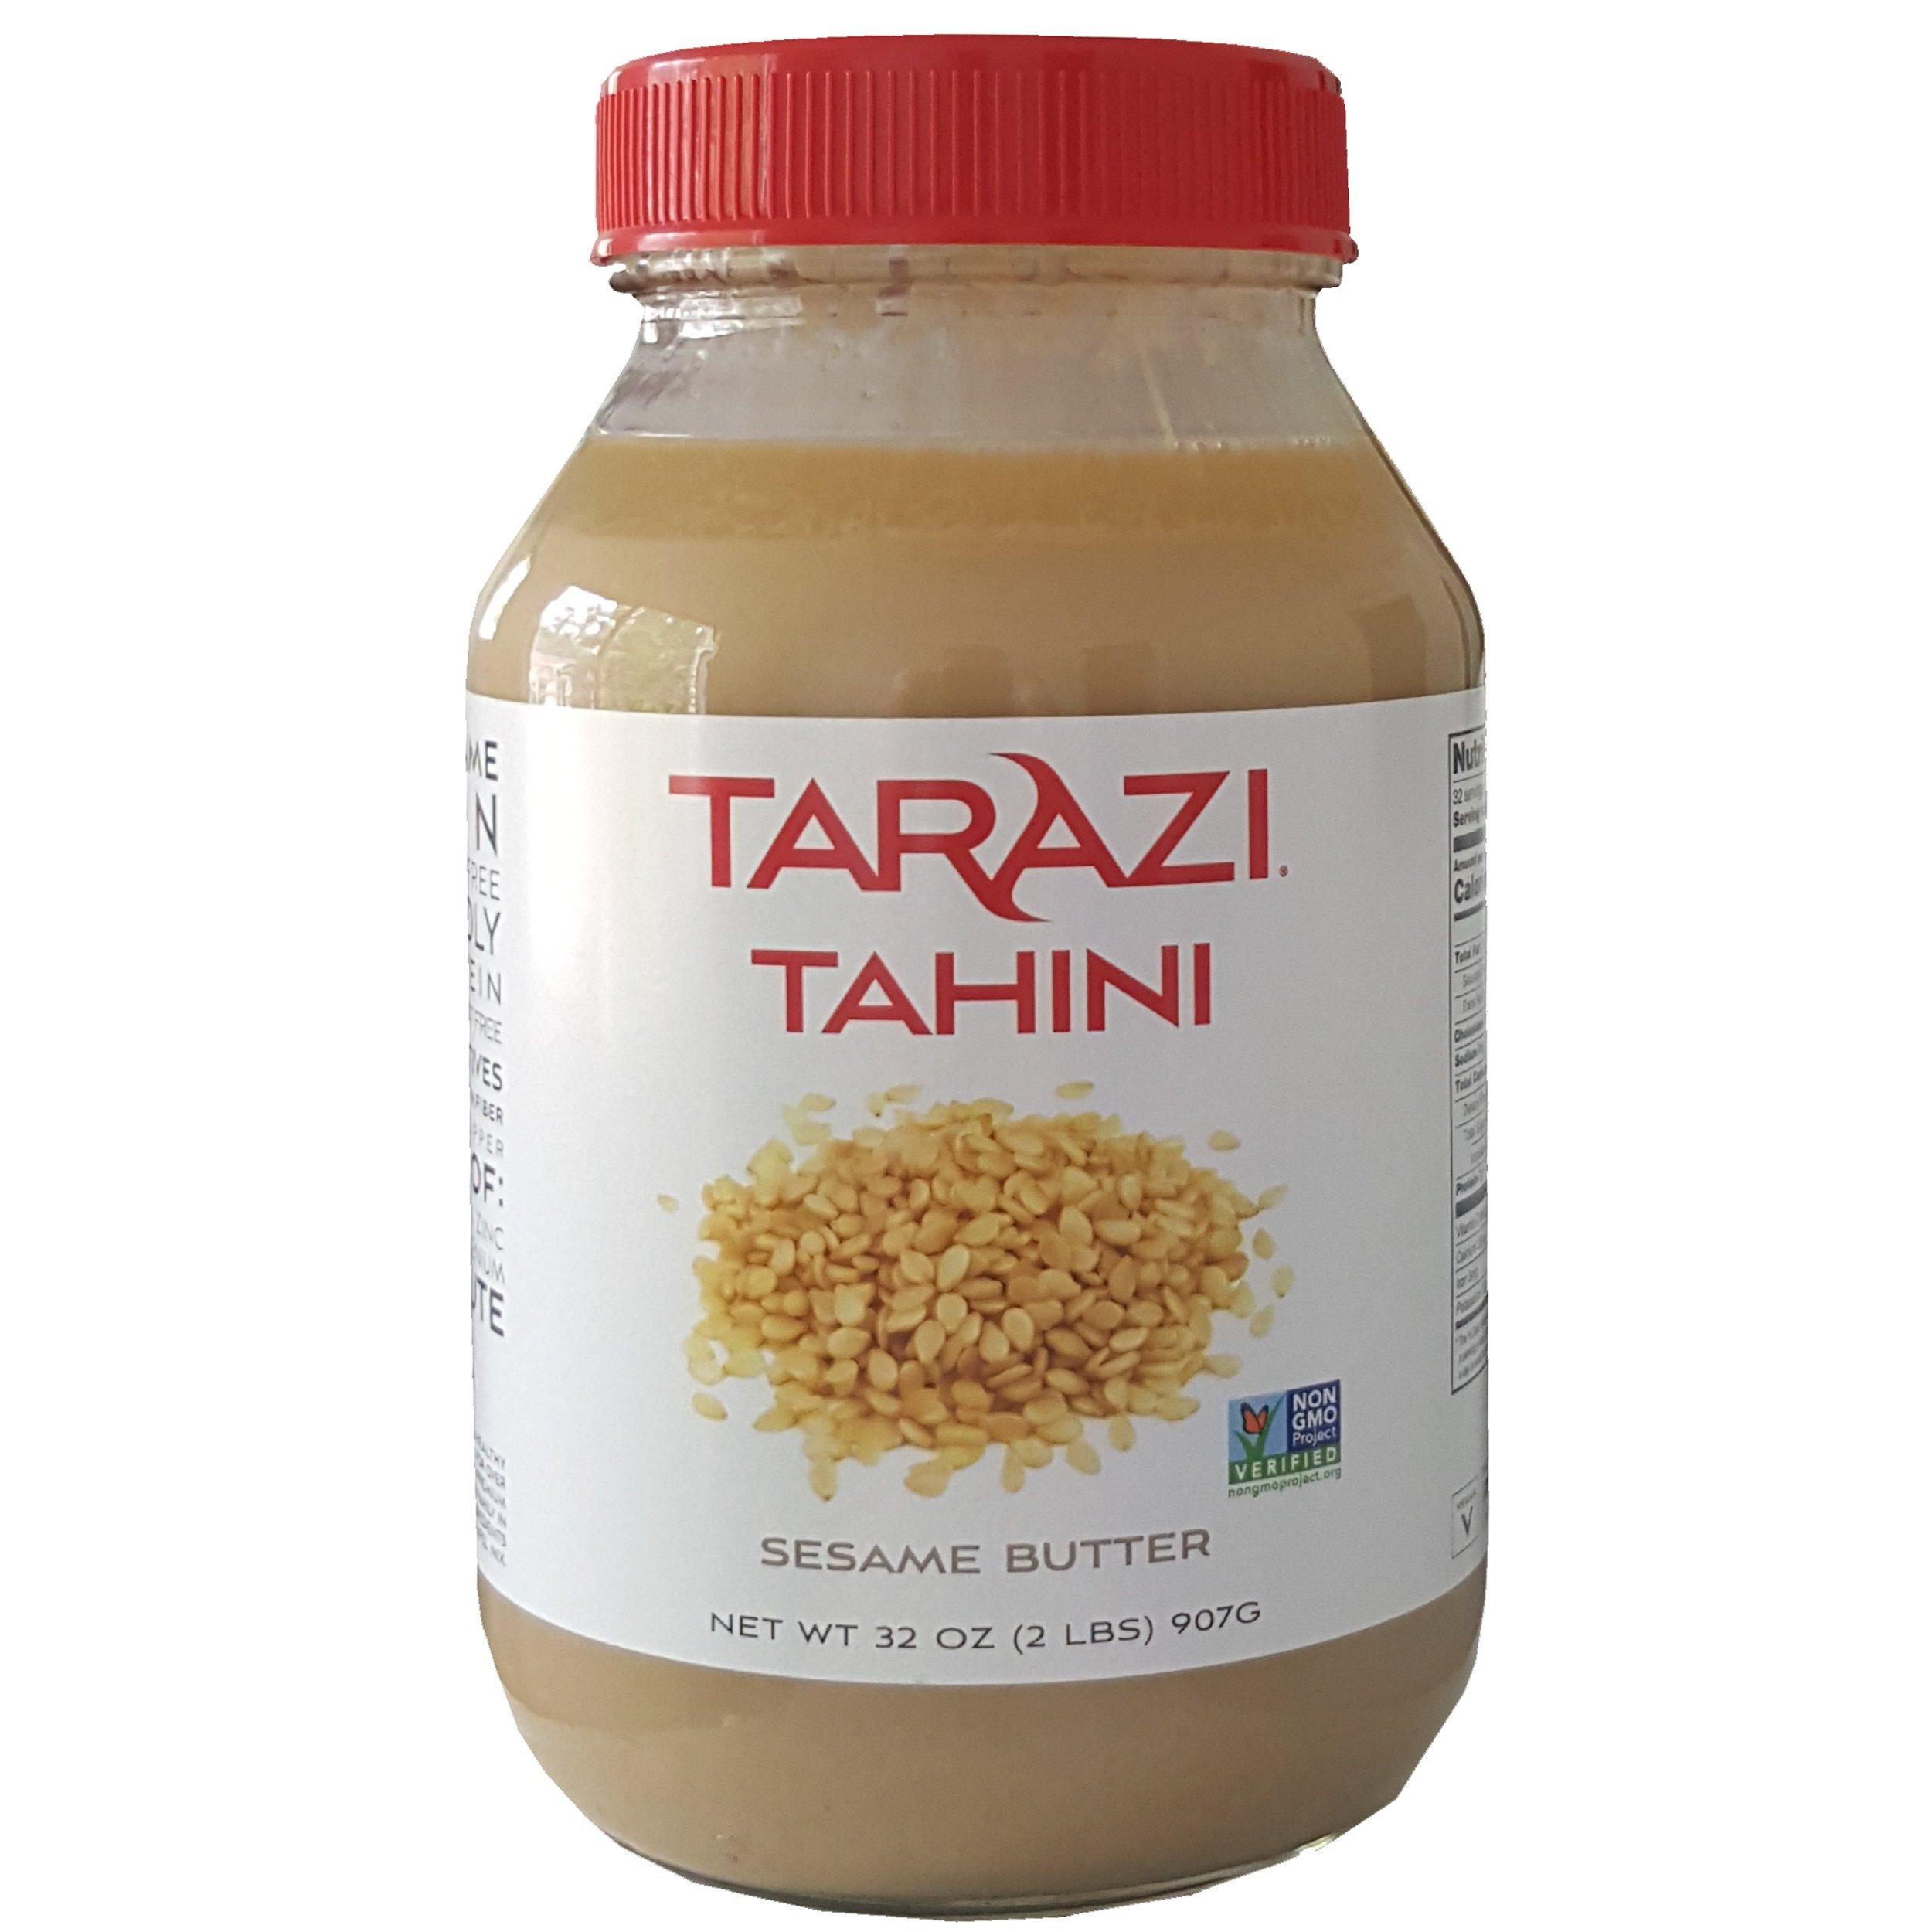 Tarazi Tahini Sesame Butter 2lbs